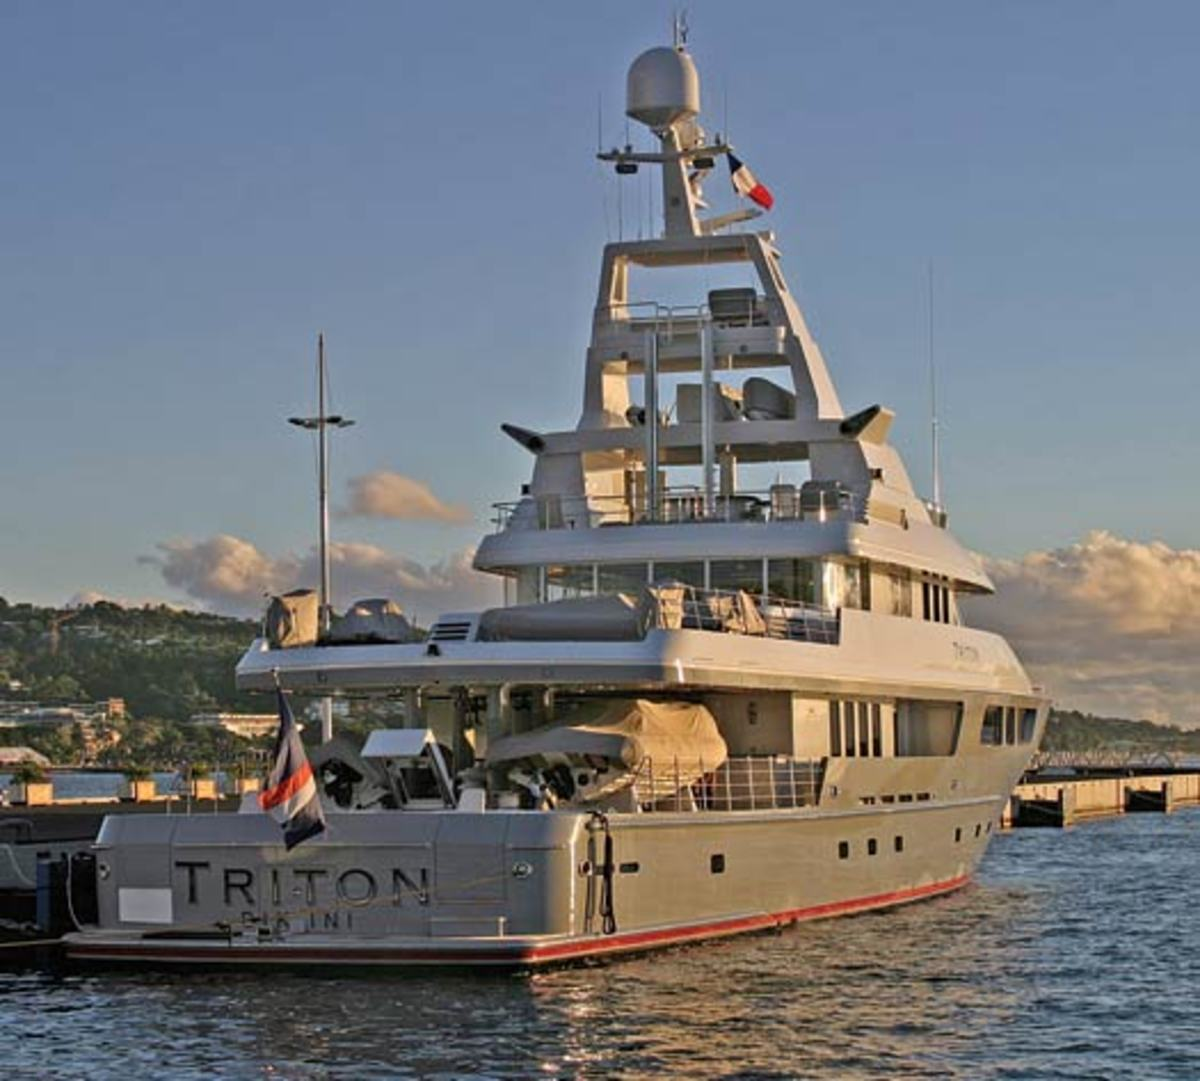 Americas 100 Largest Yachts 2007 77 Triton Power